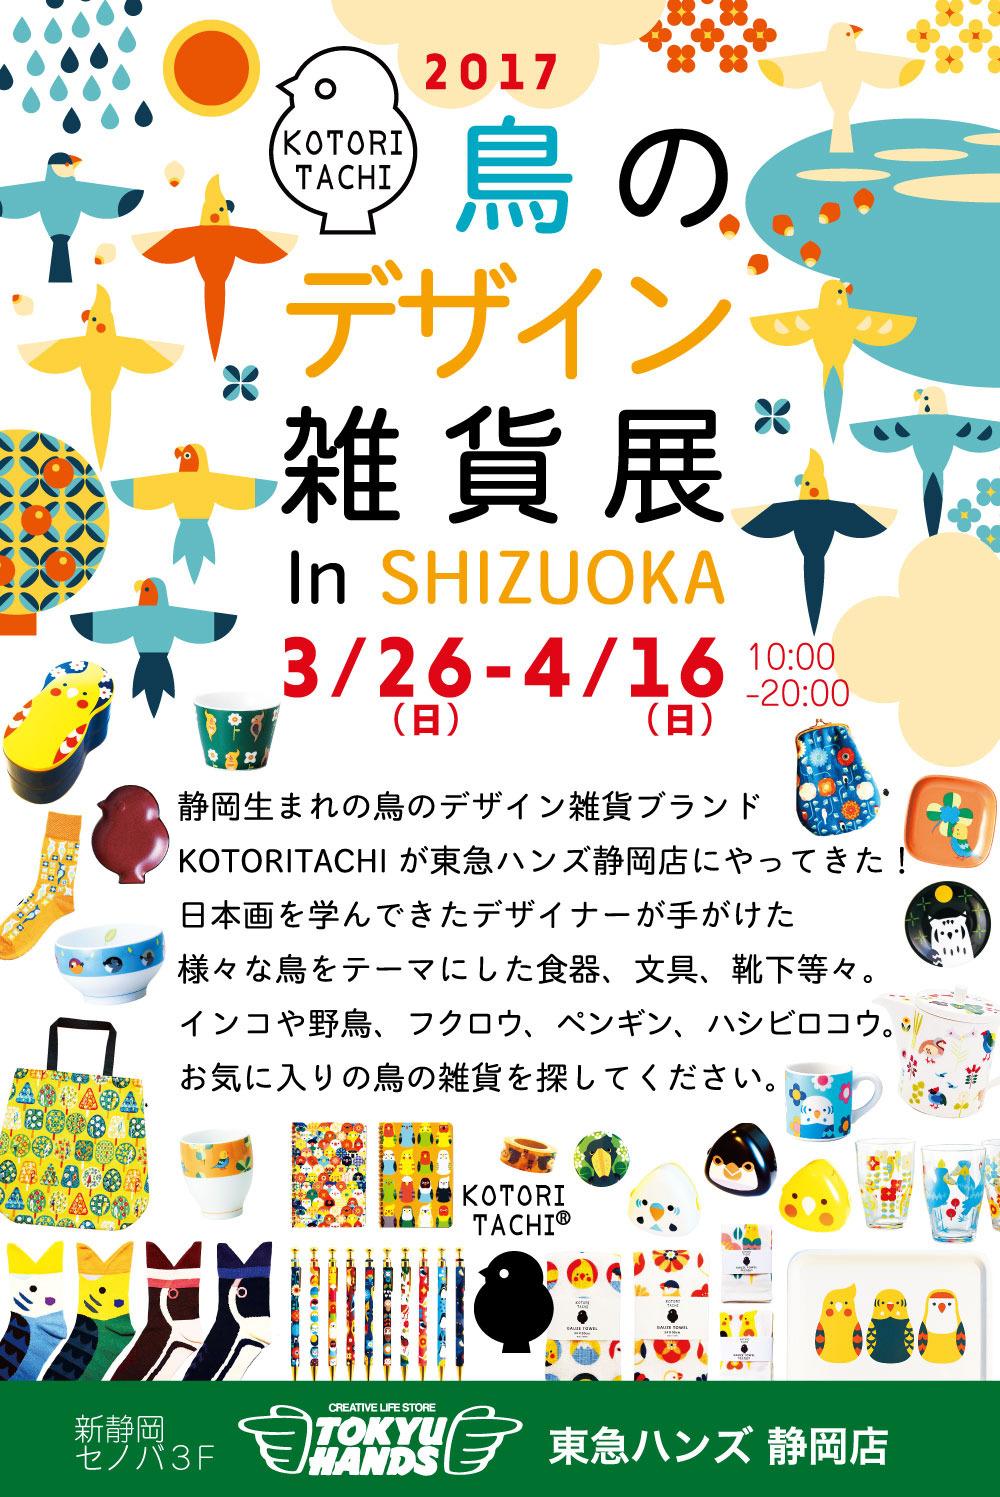 ●POP-ハンズ静岡-鳥のデザイン雑貨展InSHIZUOKA-20170305.jpg